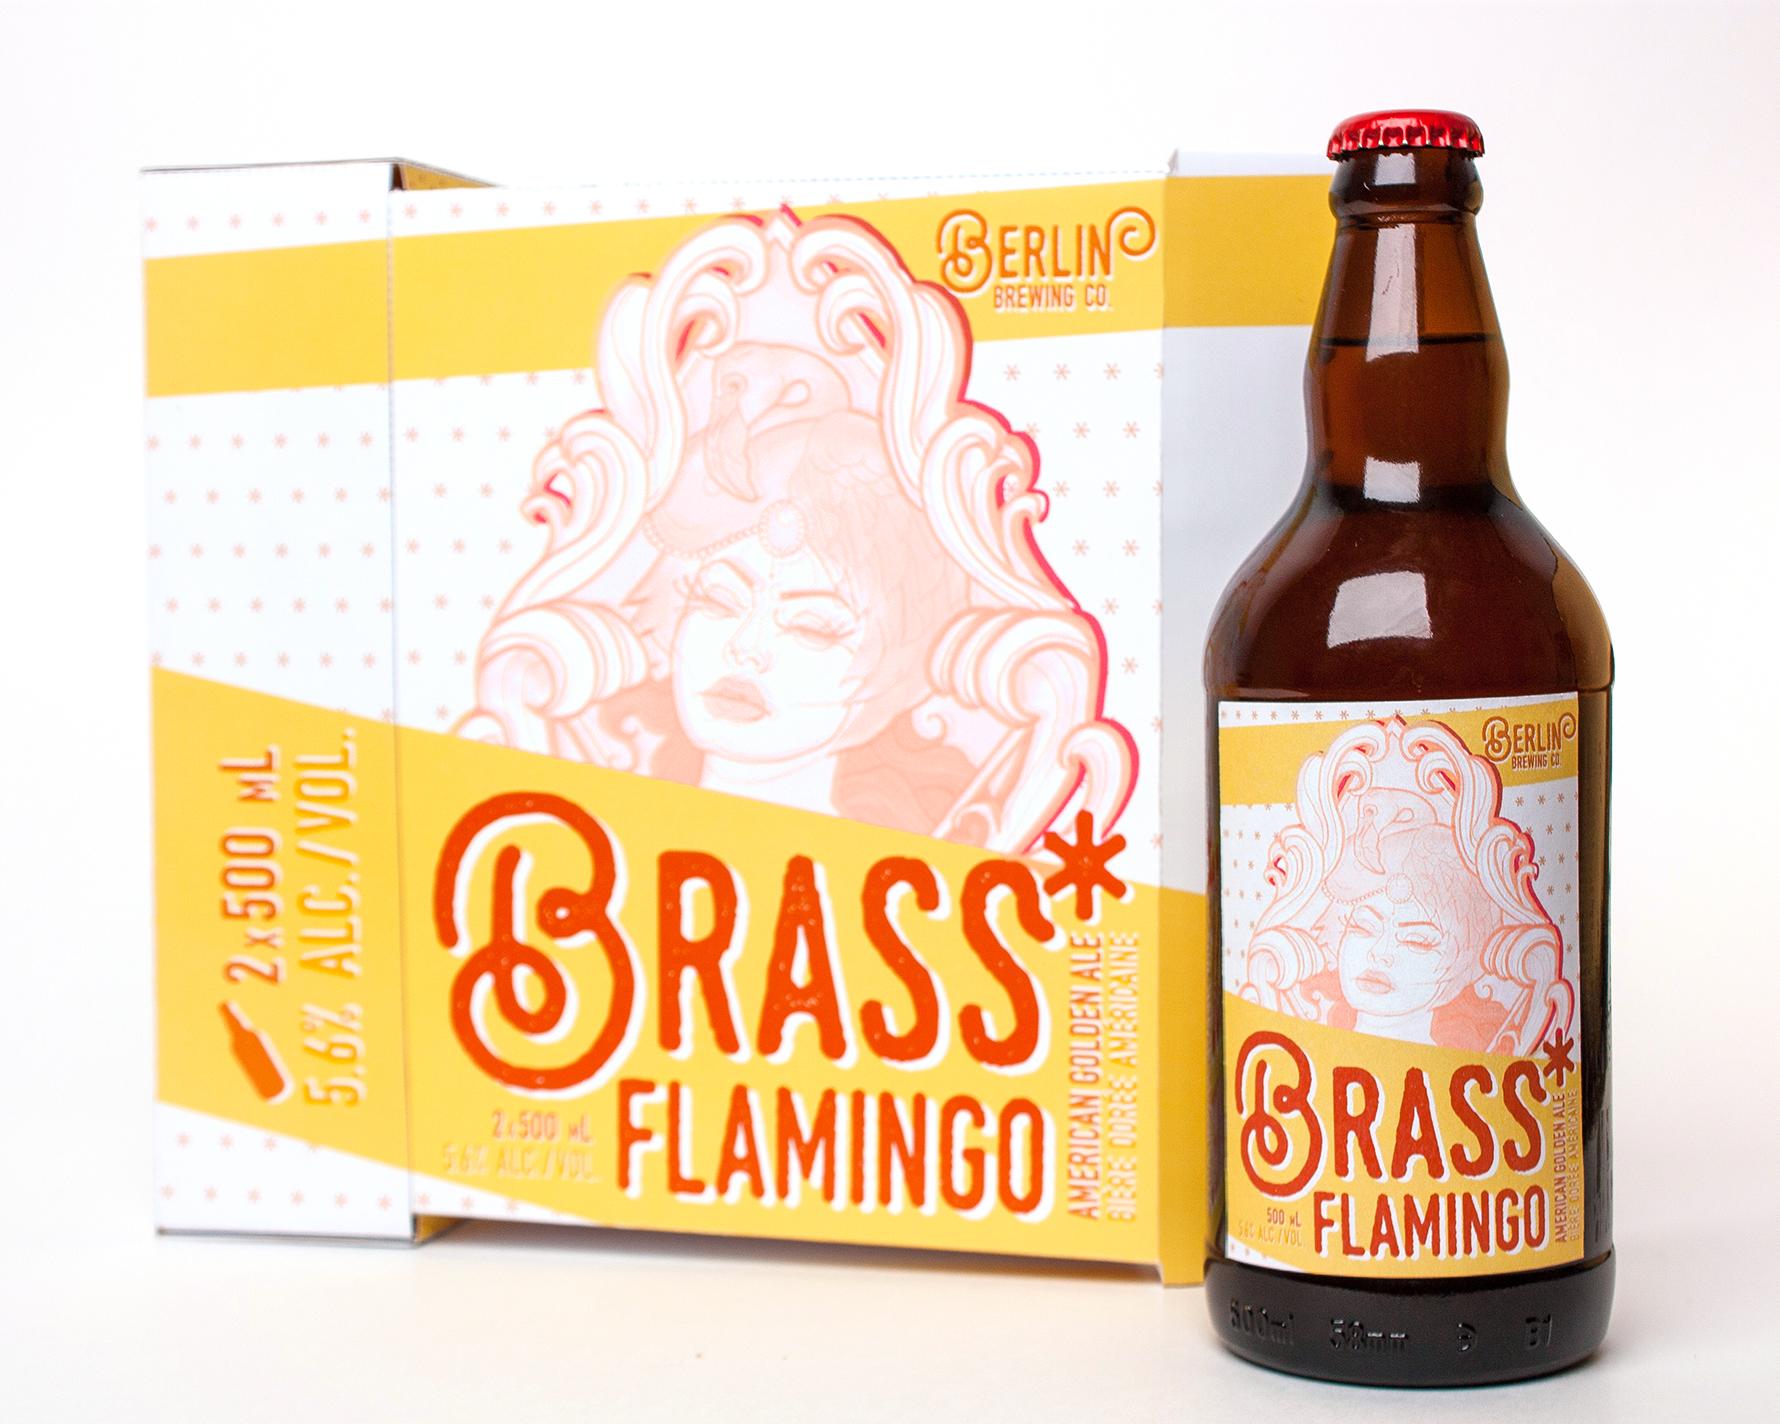 Brass Flamingo Craft Beer Packaging